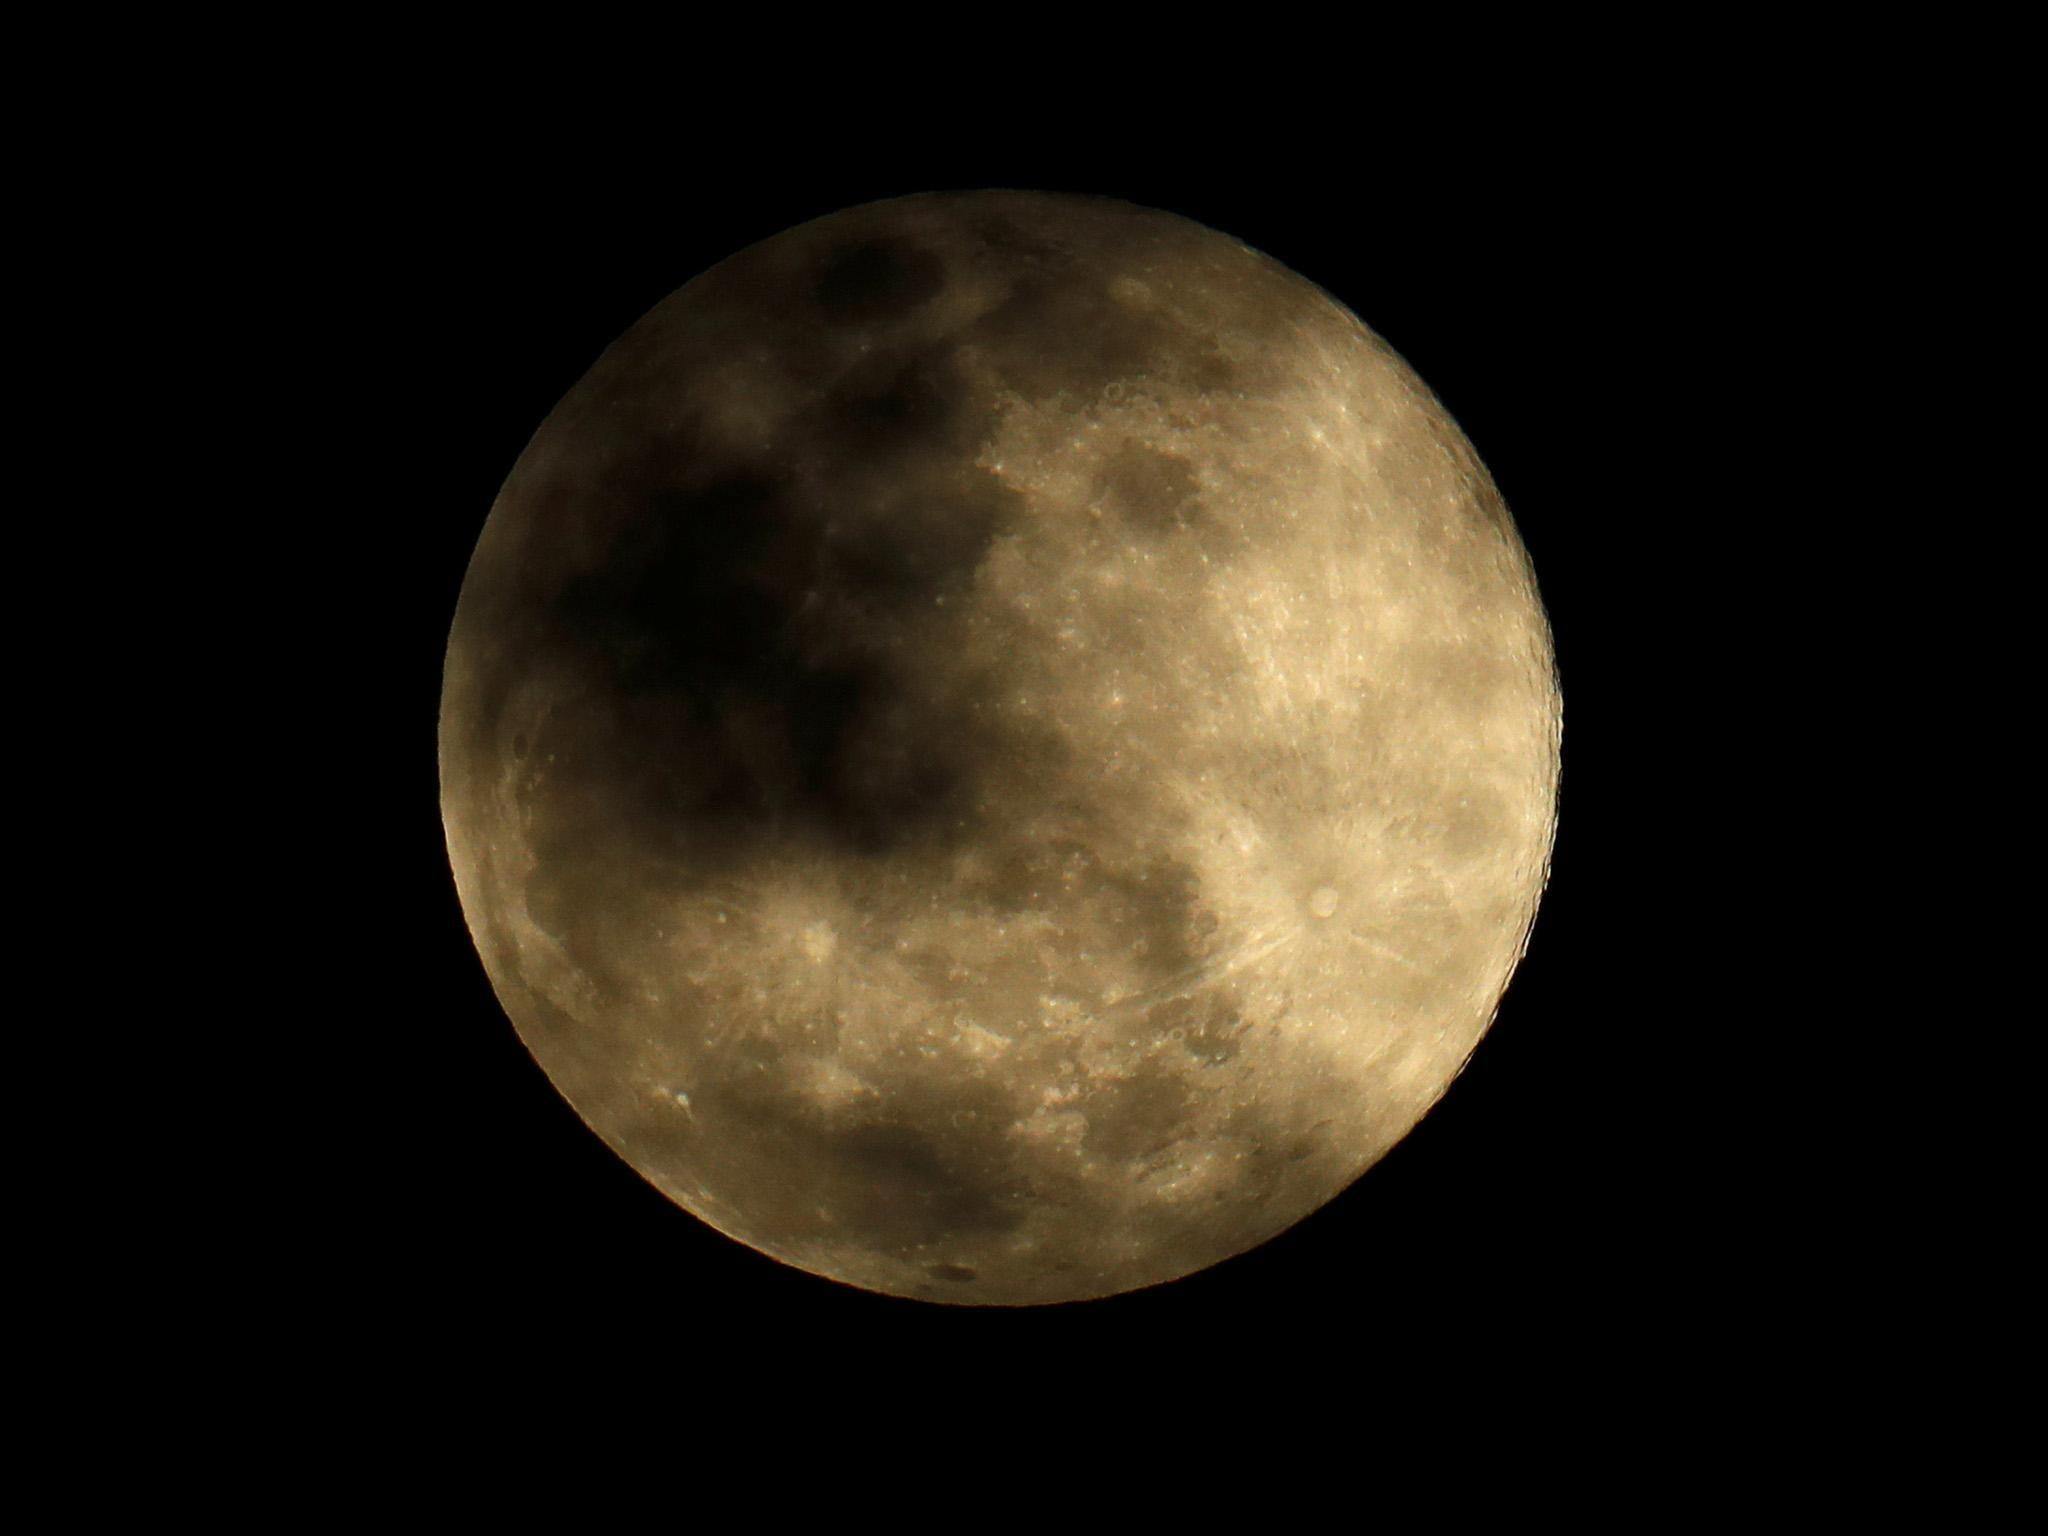 Stargazing June: Mighty Jupiter reigns supreme | The Independent